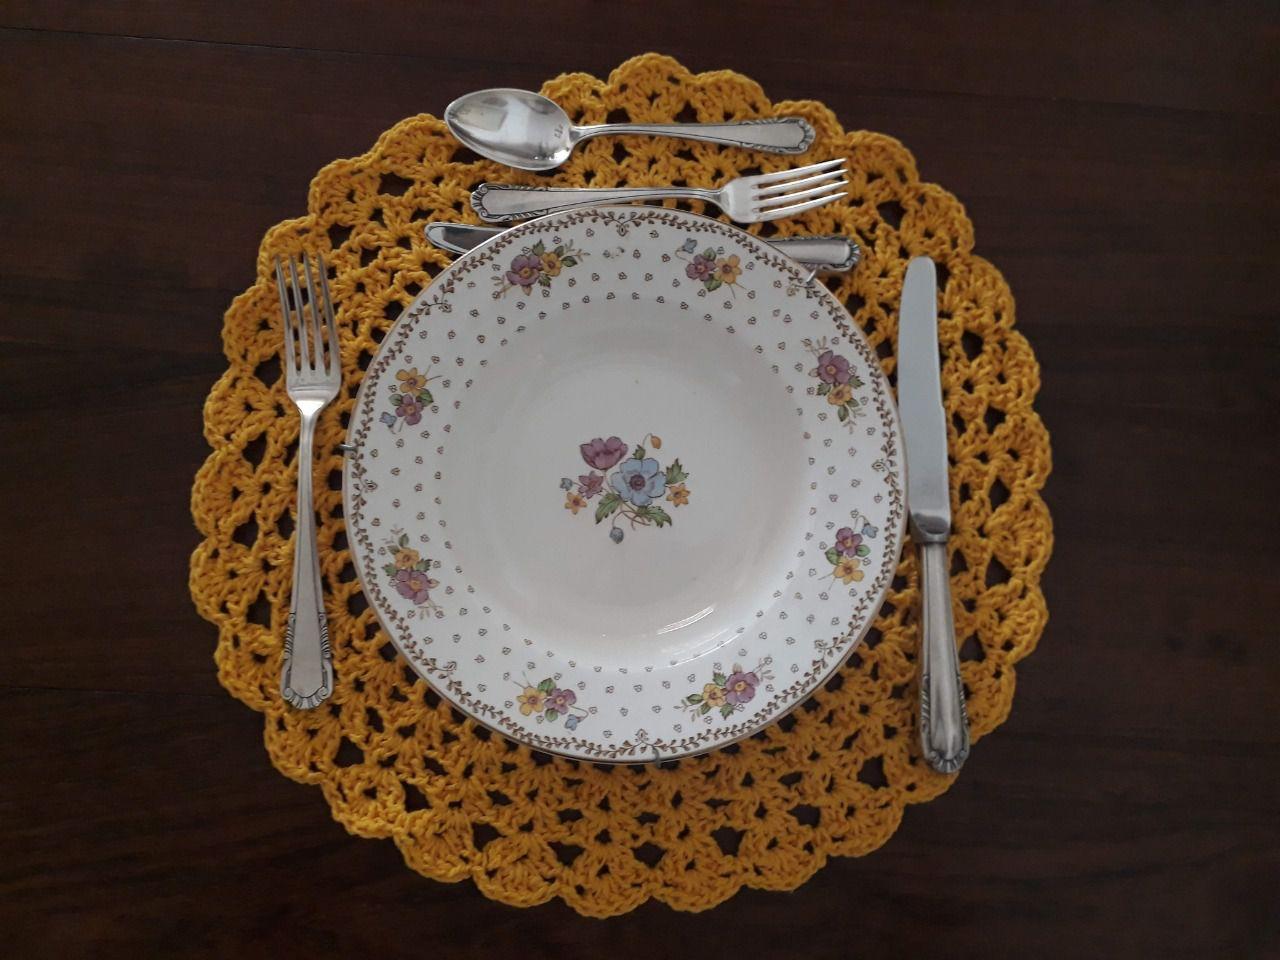 Sousplat de Crochet Amarelo Kit com 12  - Helô Reis Store